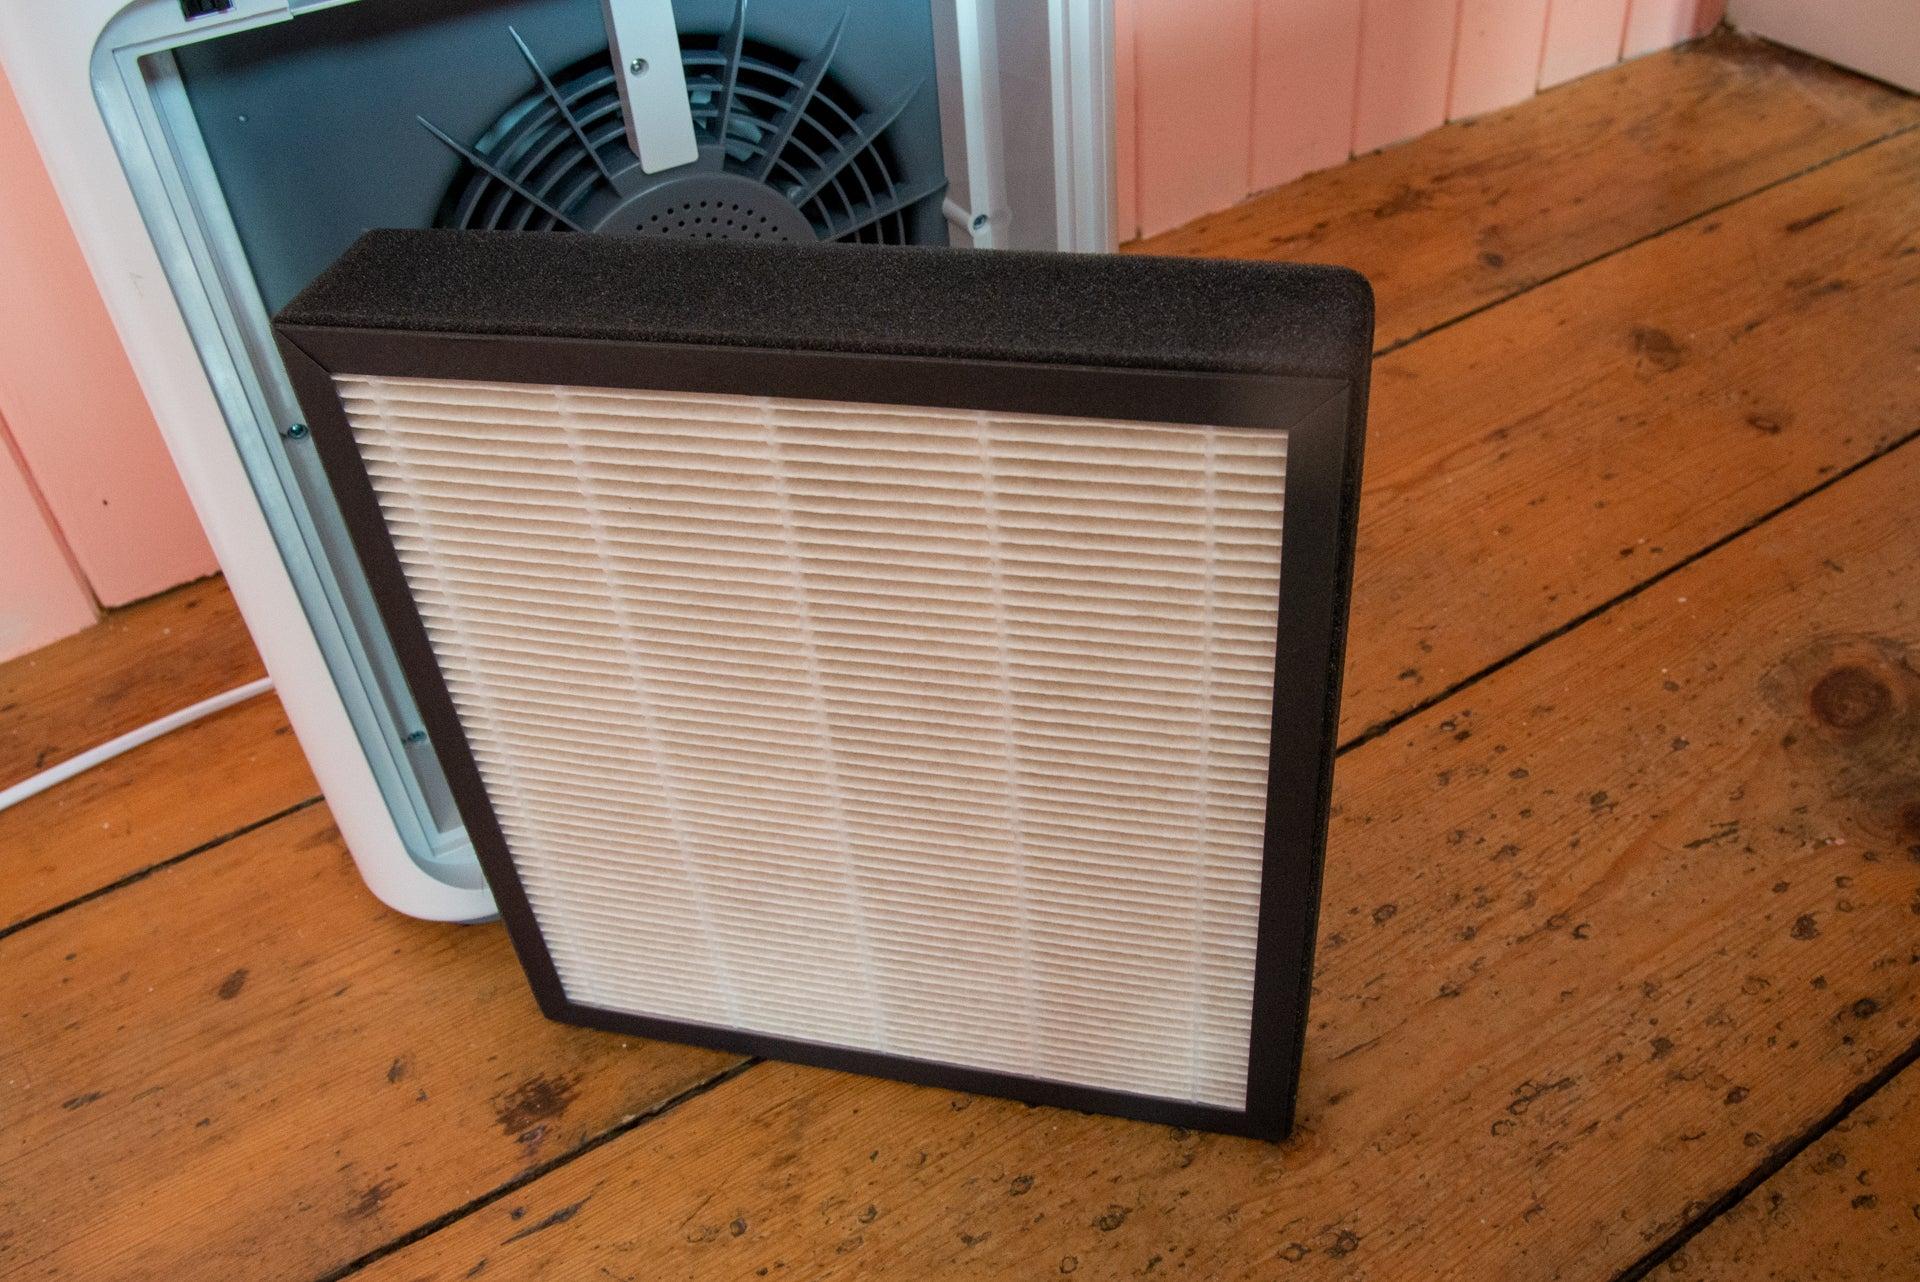 Elechomes Smart WiFi Air Purifier A3B replaceable filter